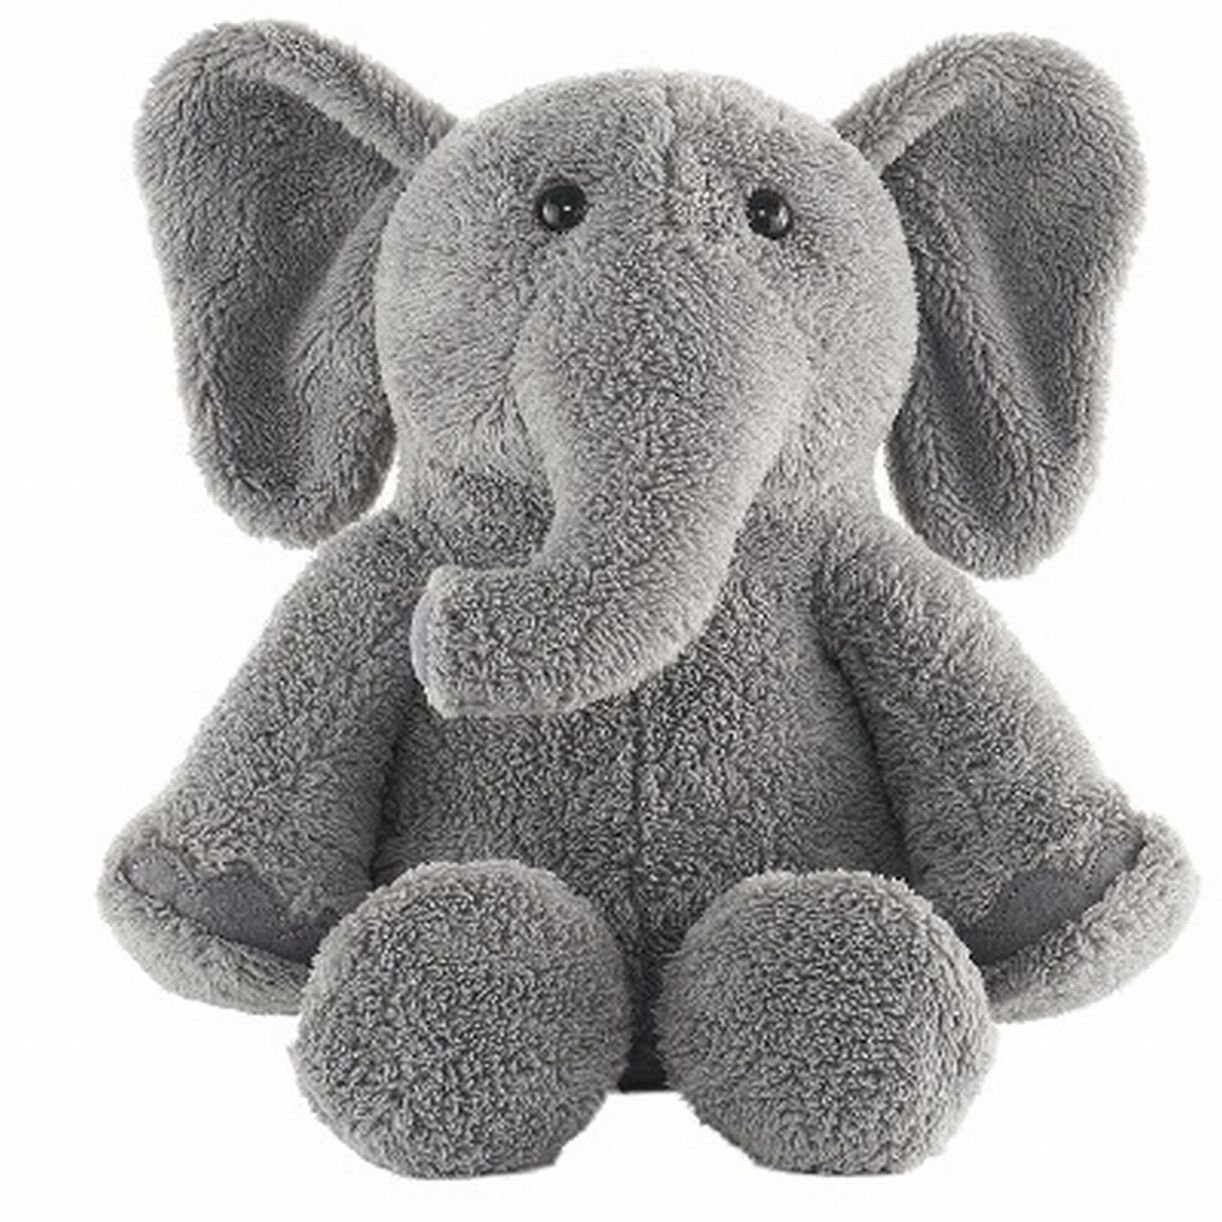 Amazon Kohls Care Gray Elephant Plush 115 Inches Tall Toys Games